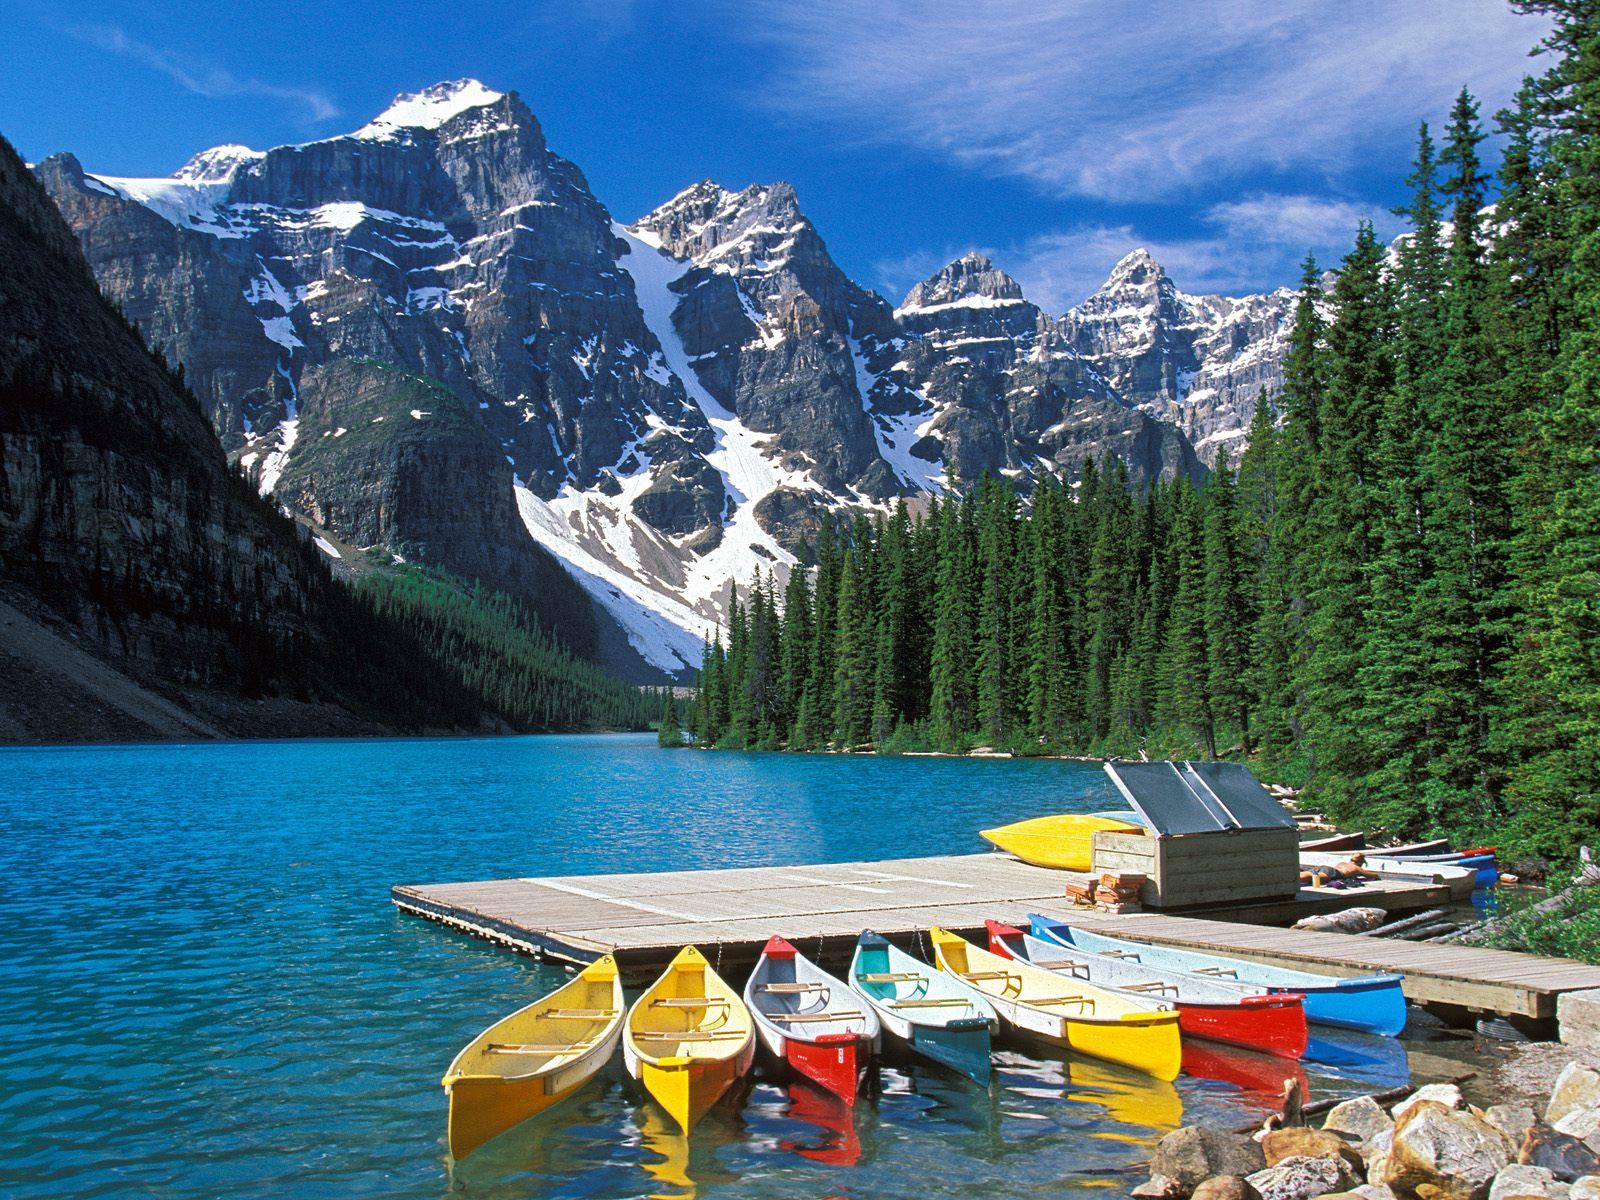 Park Canada photo Moraine Lake Banff National Park Canada wallpaper 1600x1200